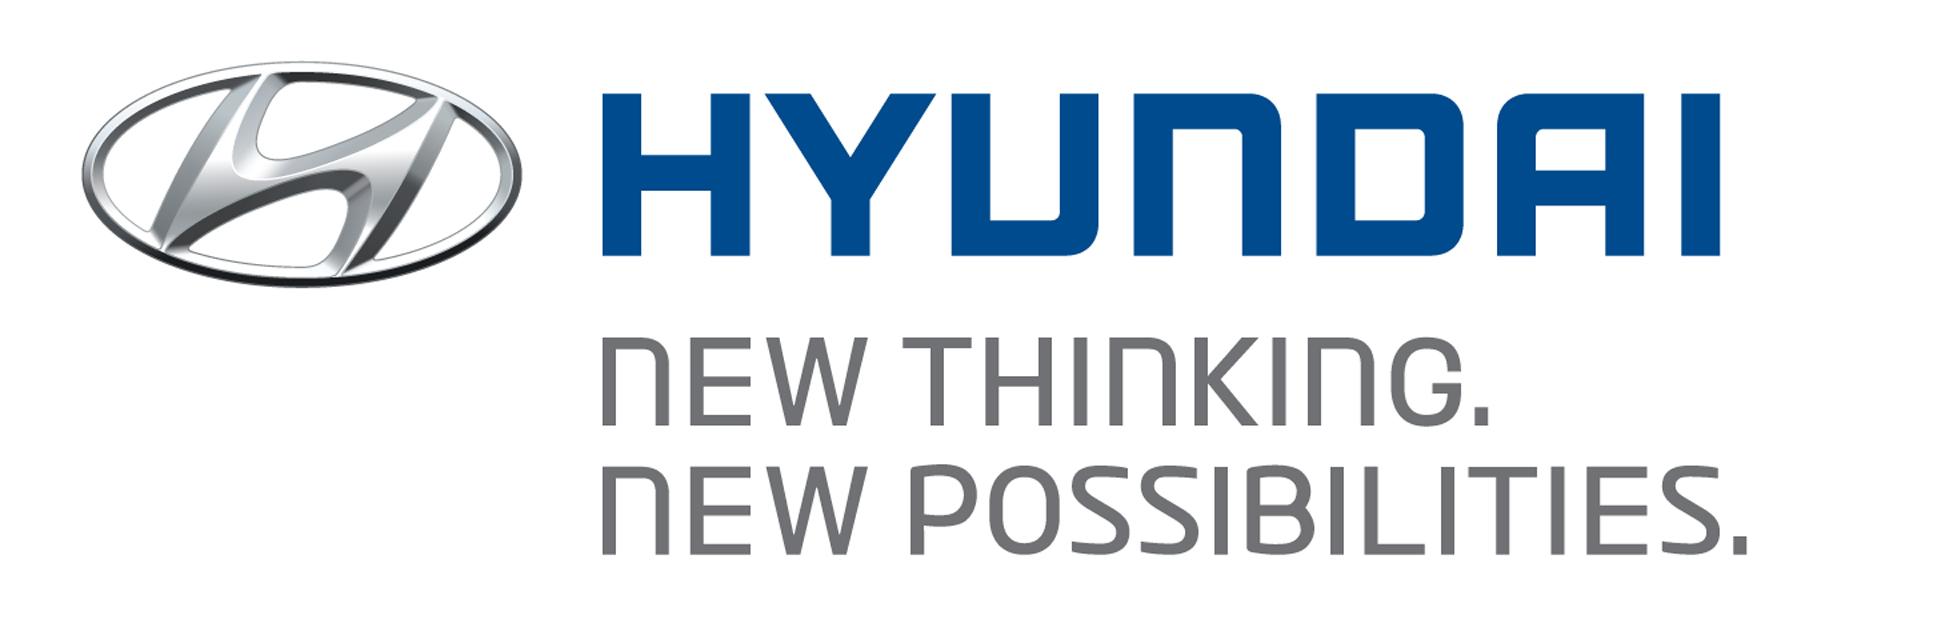 What is the slogan of each automobile company like Suzuki, Hyundai ...